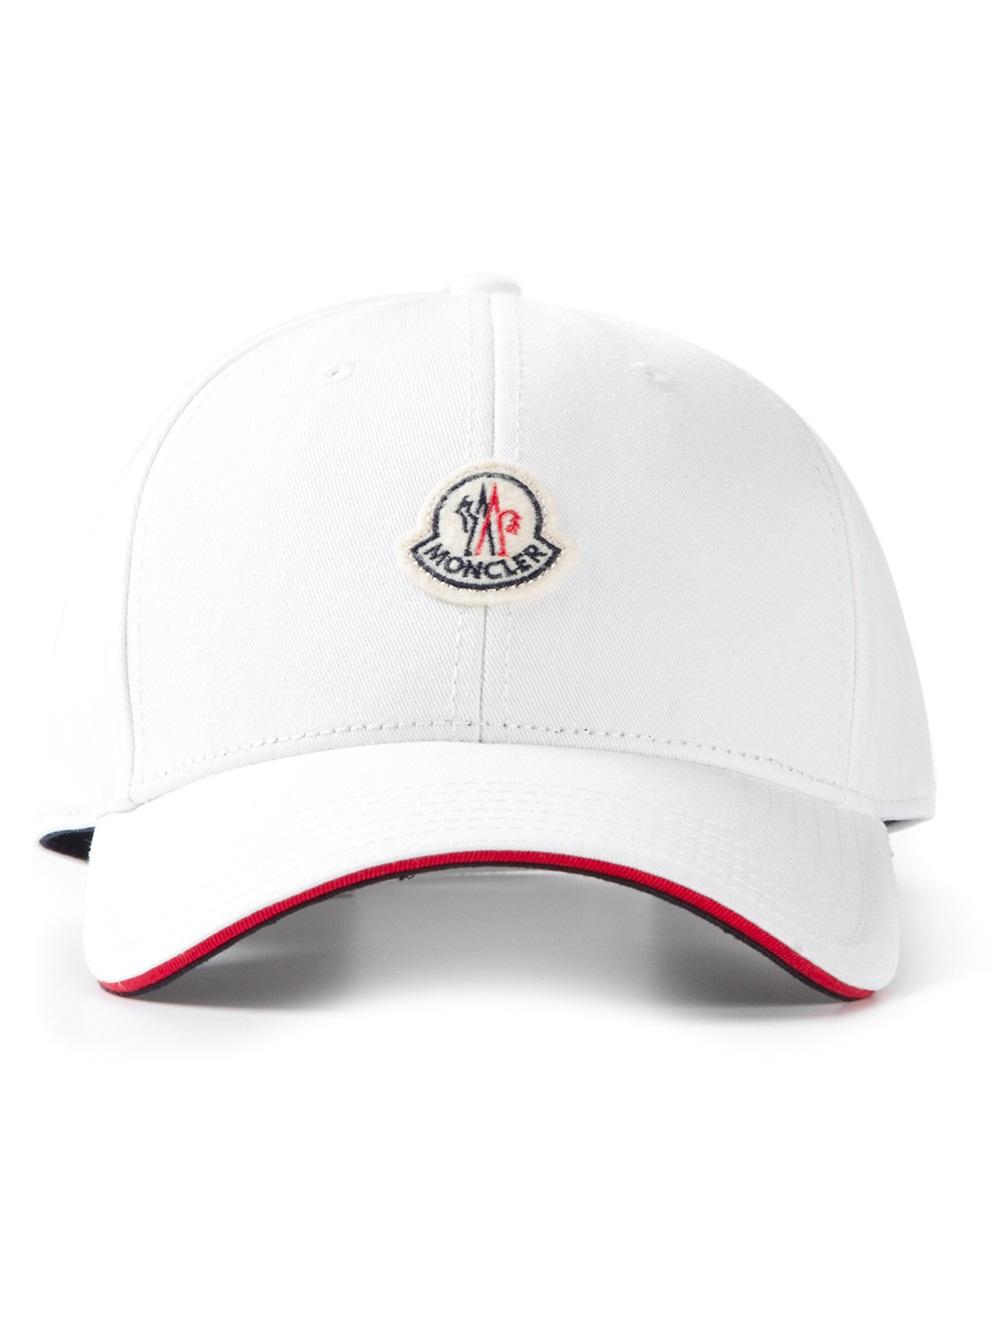 e73b469a2ec Gallery. Previously sold at  Farfetch · Men s Baseball Caps Men s Wide Brim  Hats ...